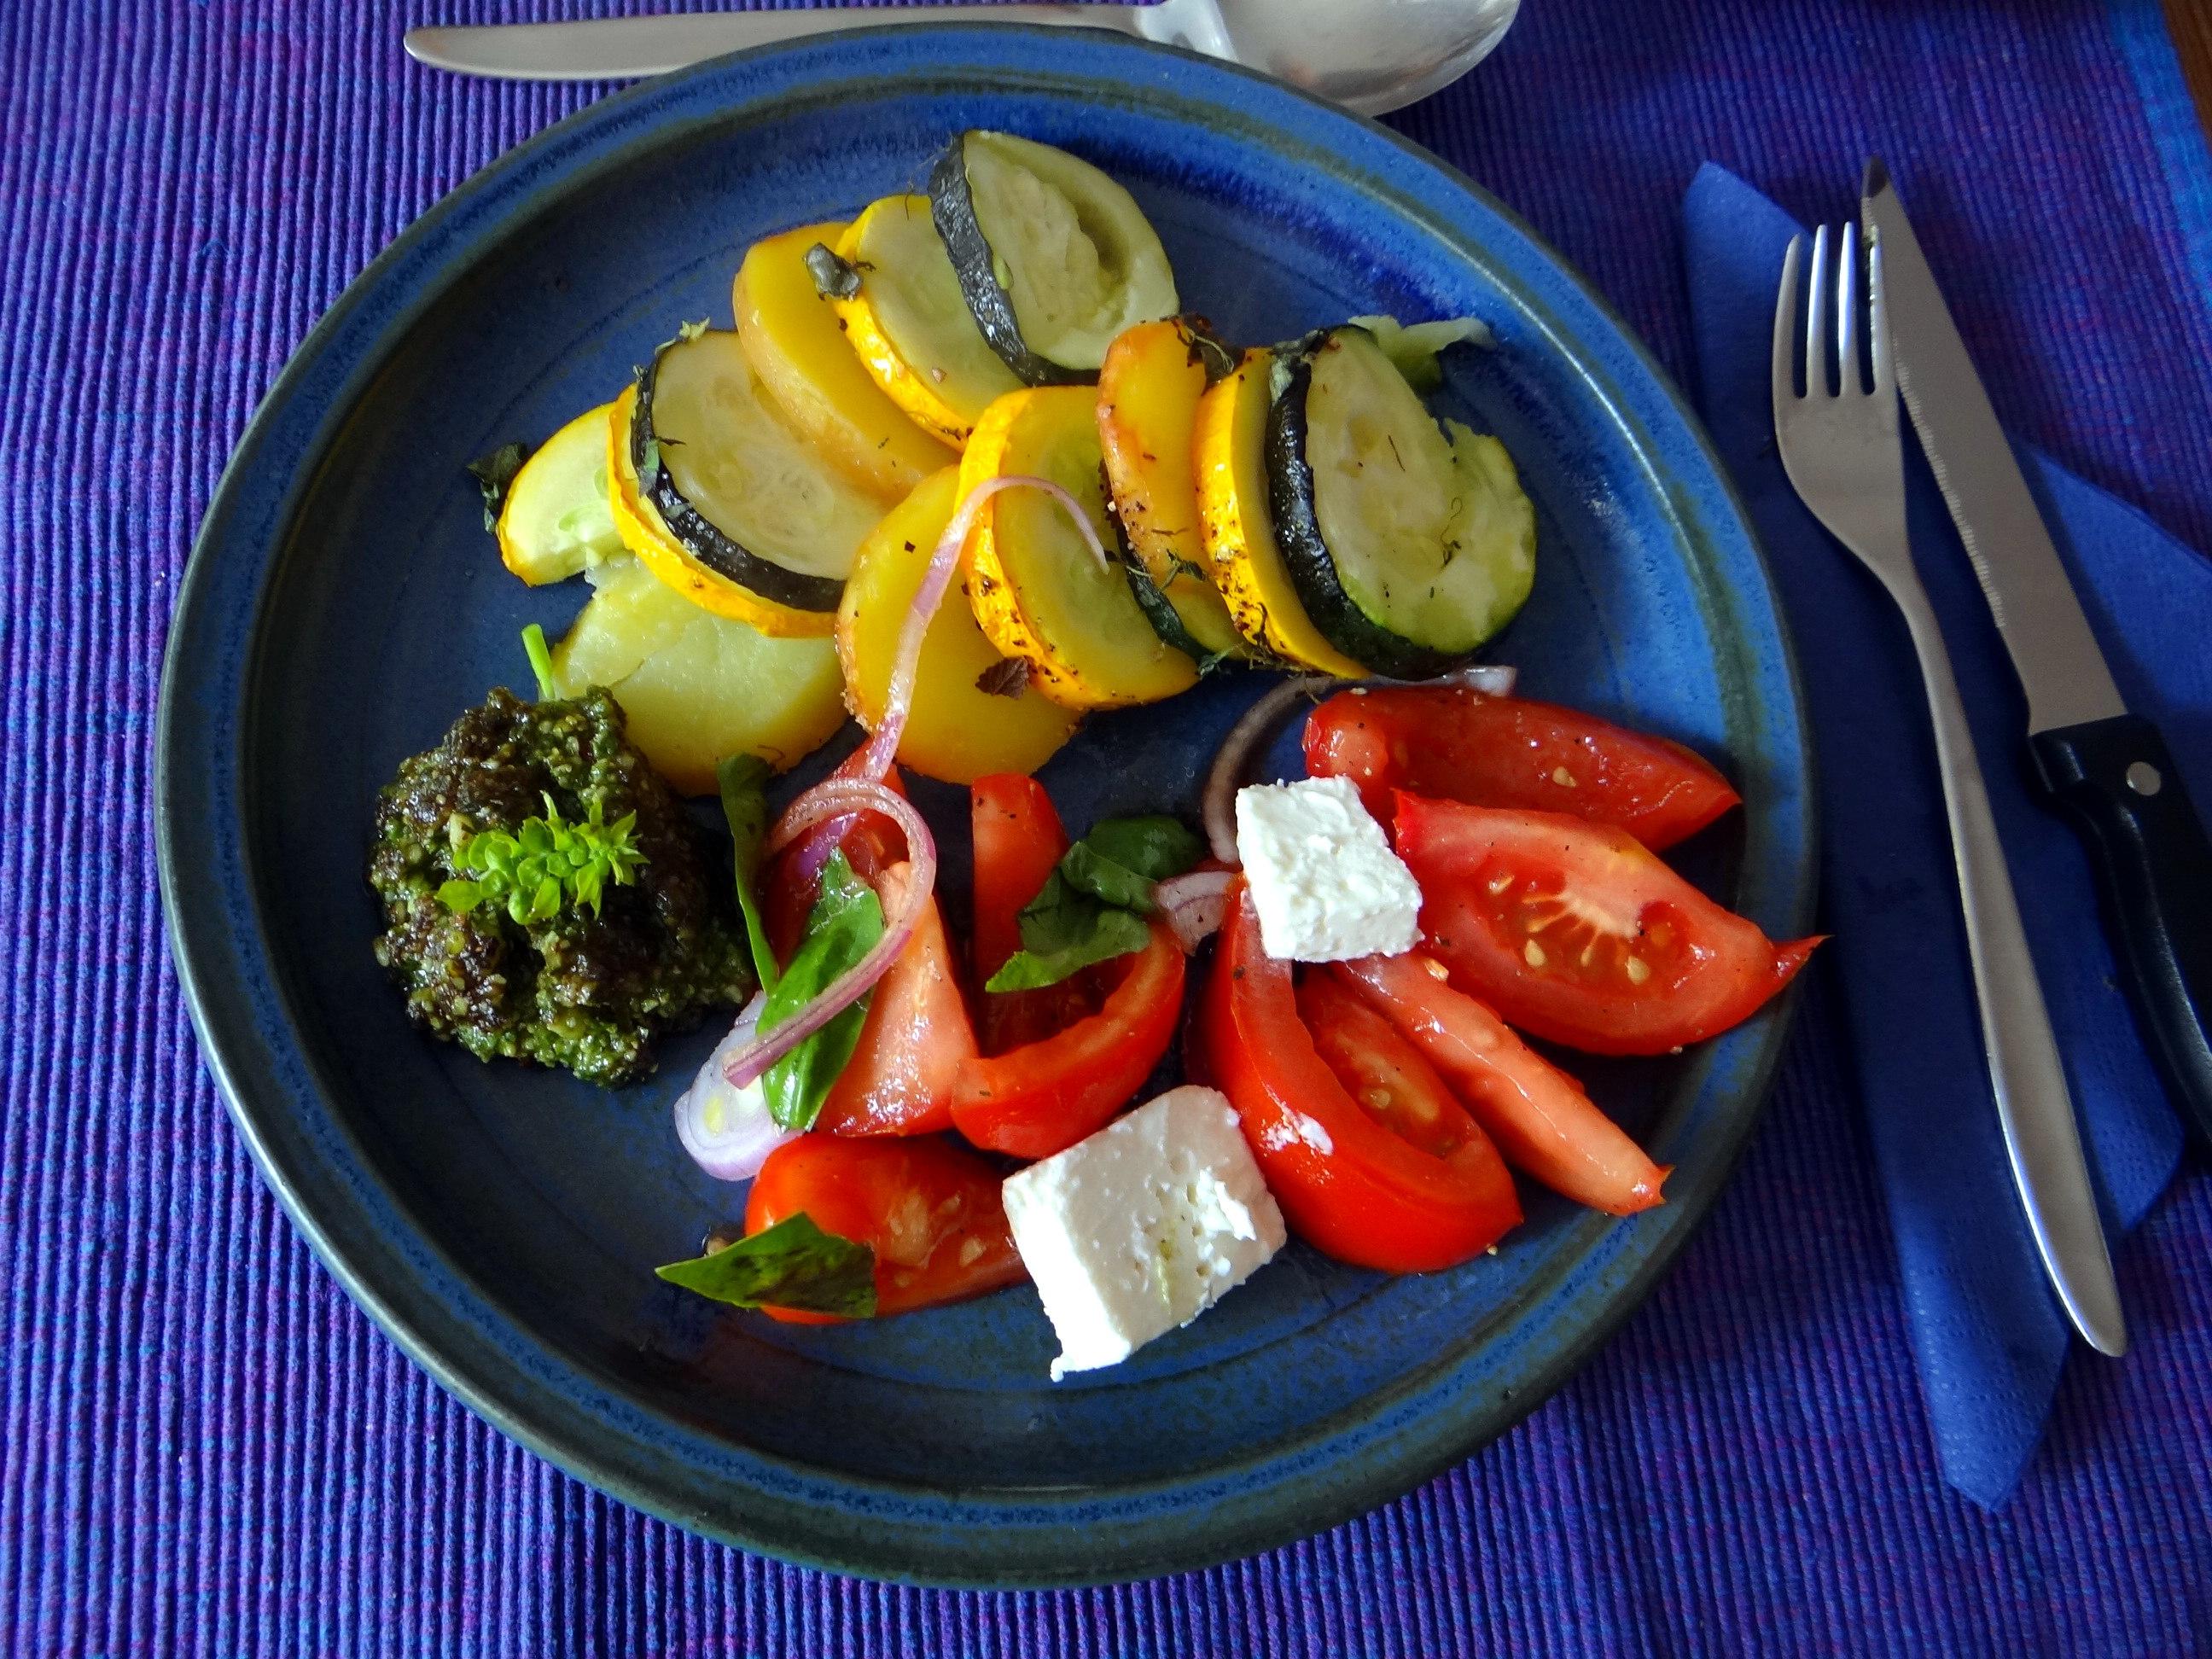 Kartoffel-Auberginen Gratin,Basilikum Pesto,Tomatensalat (3)